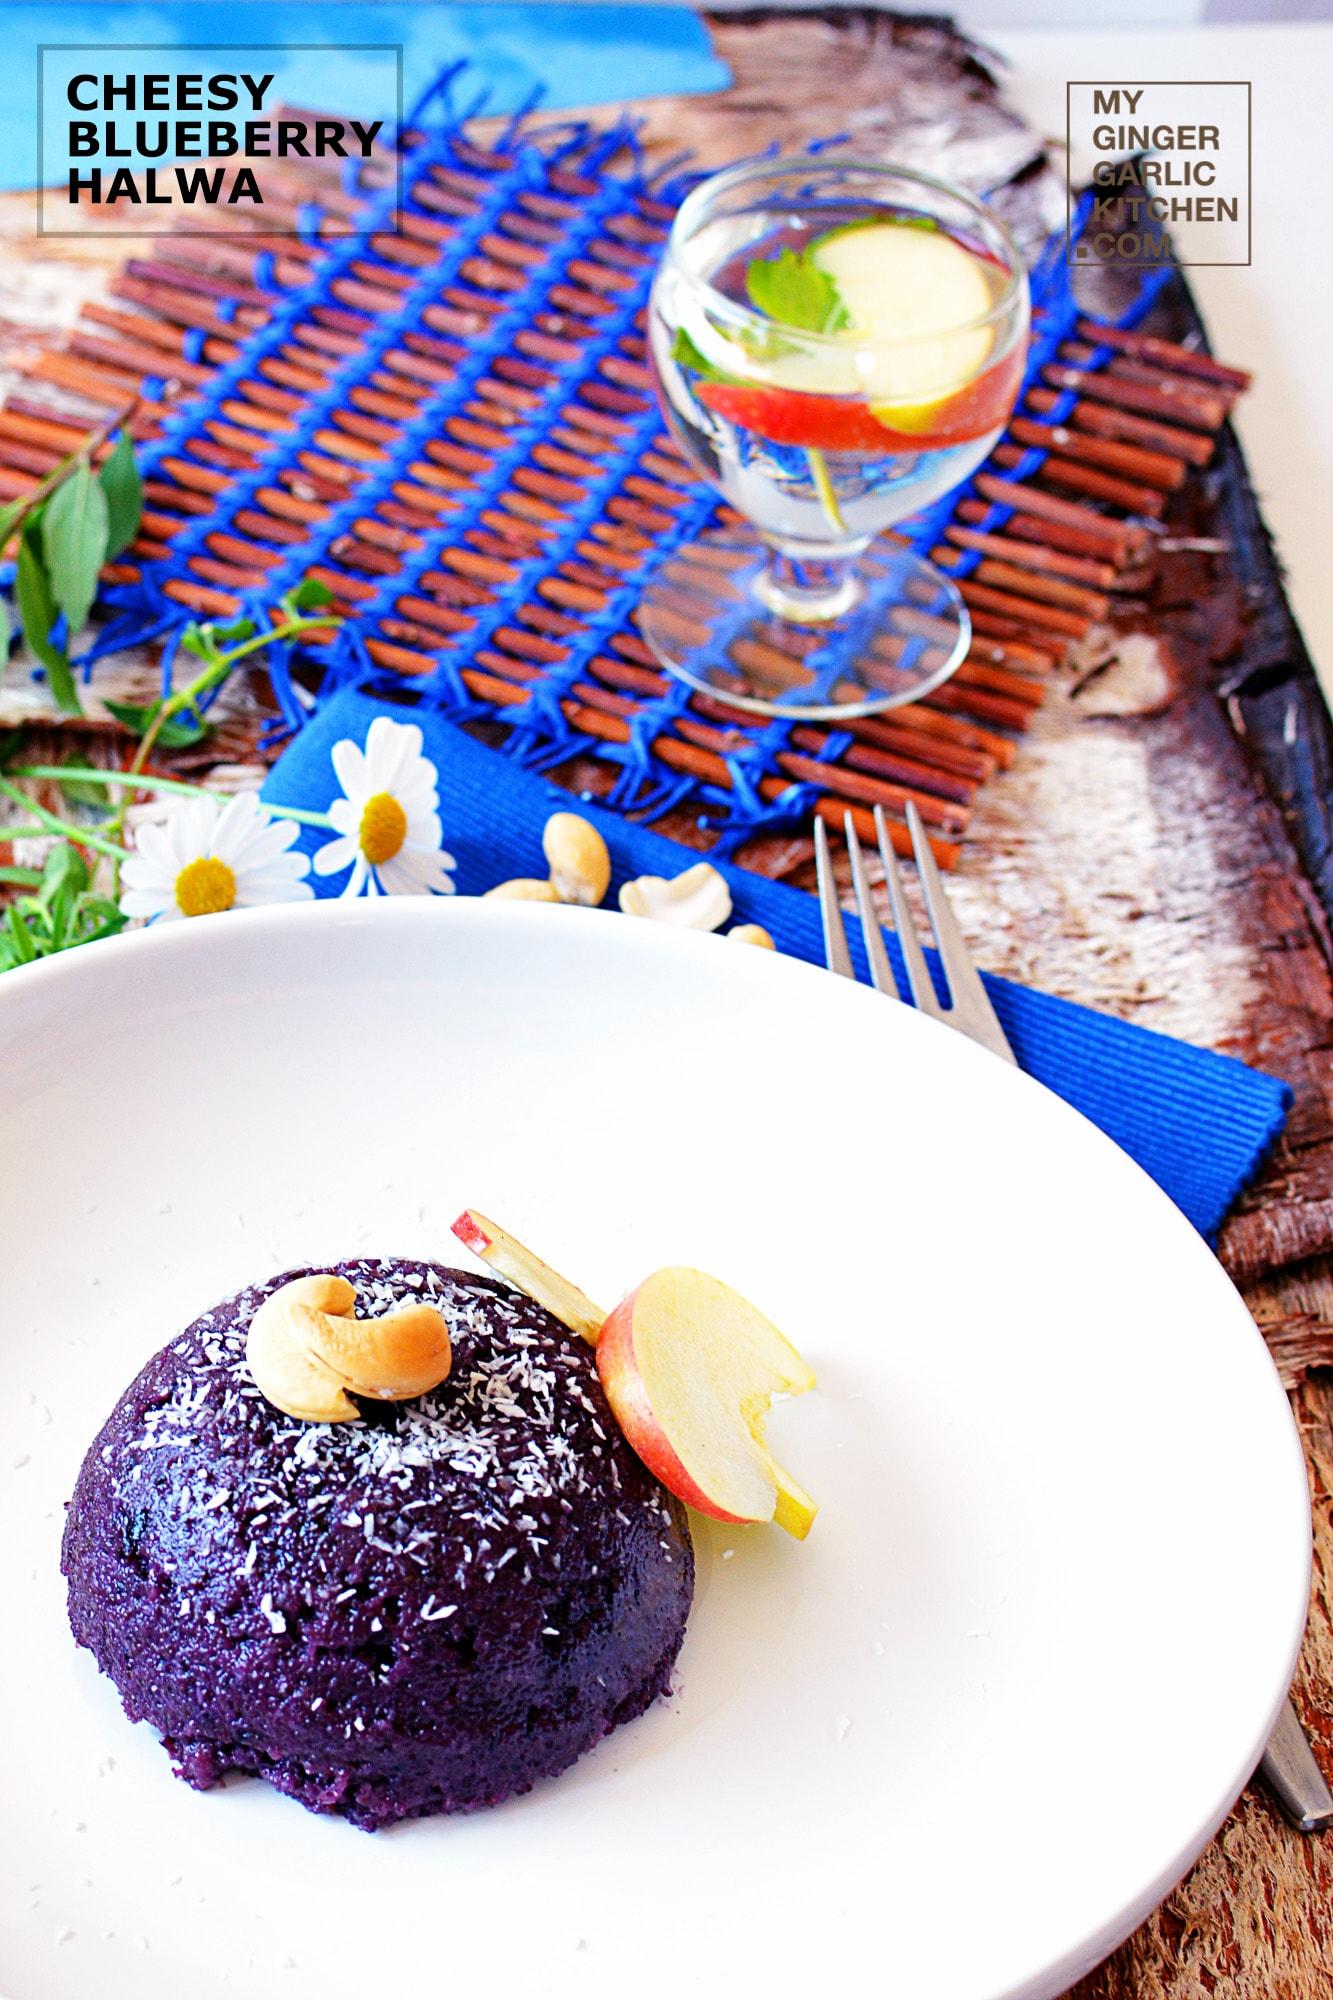 Image - recipe cheesy blueberry halwa anupama paliwal my ginger garlic kitchen 1 copy